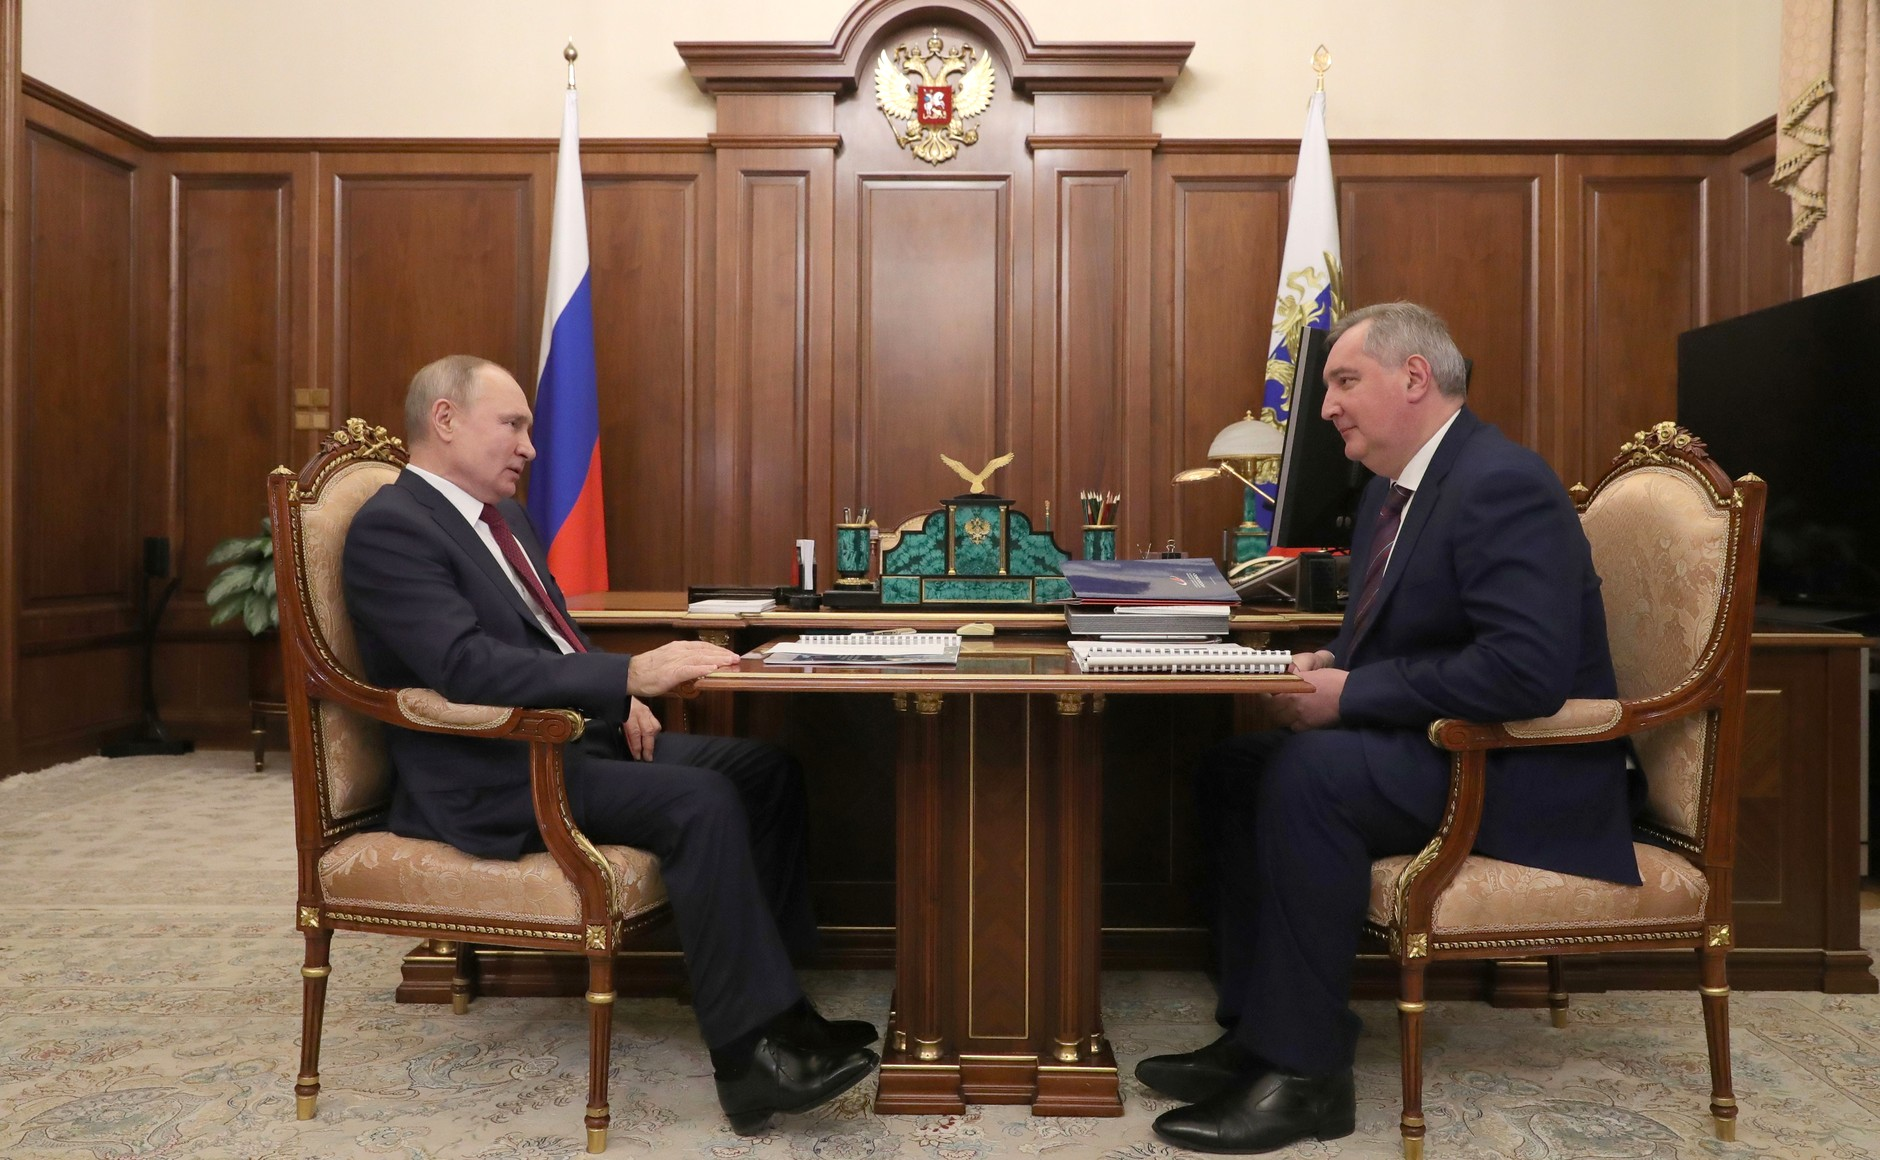 ROSCOSMOS 1 SUR 3 Rencontre avec le chef de Roscosmos Dmitry Rogozin 20.02.2021